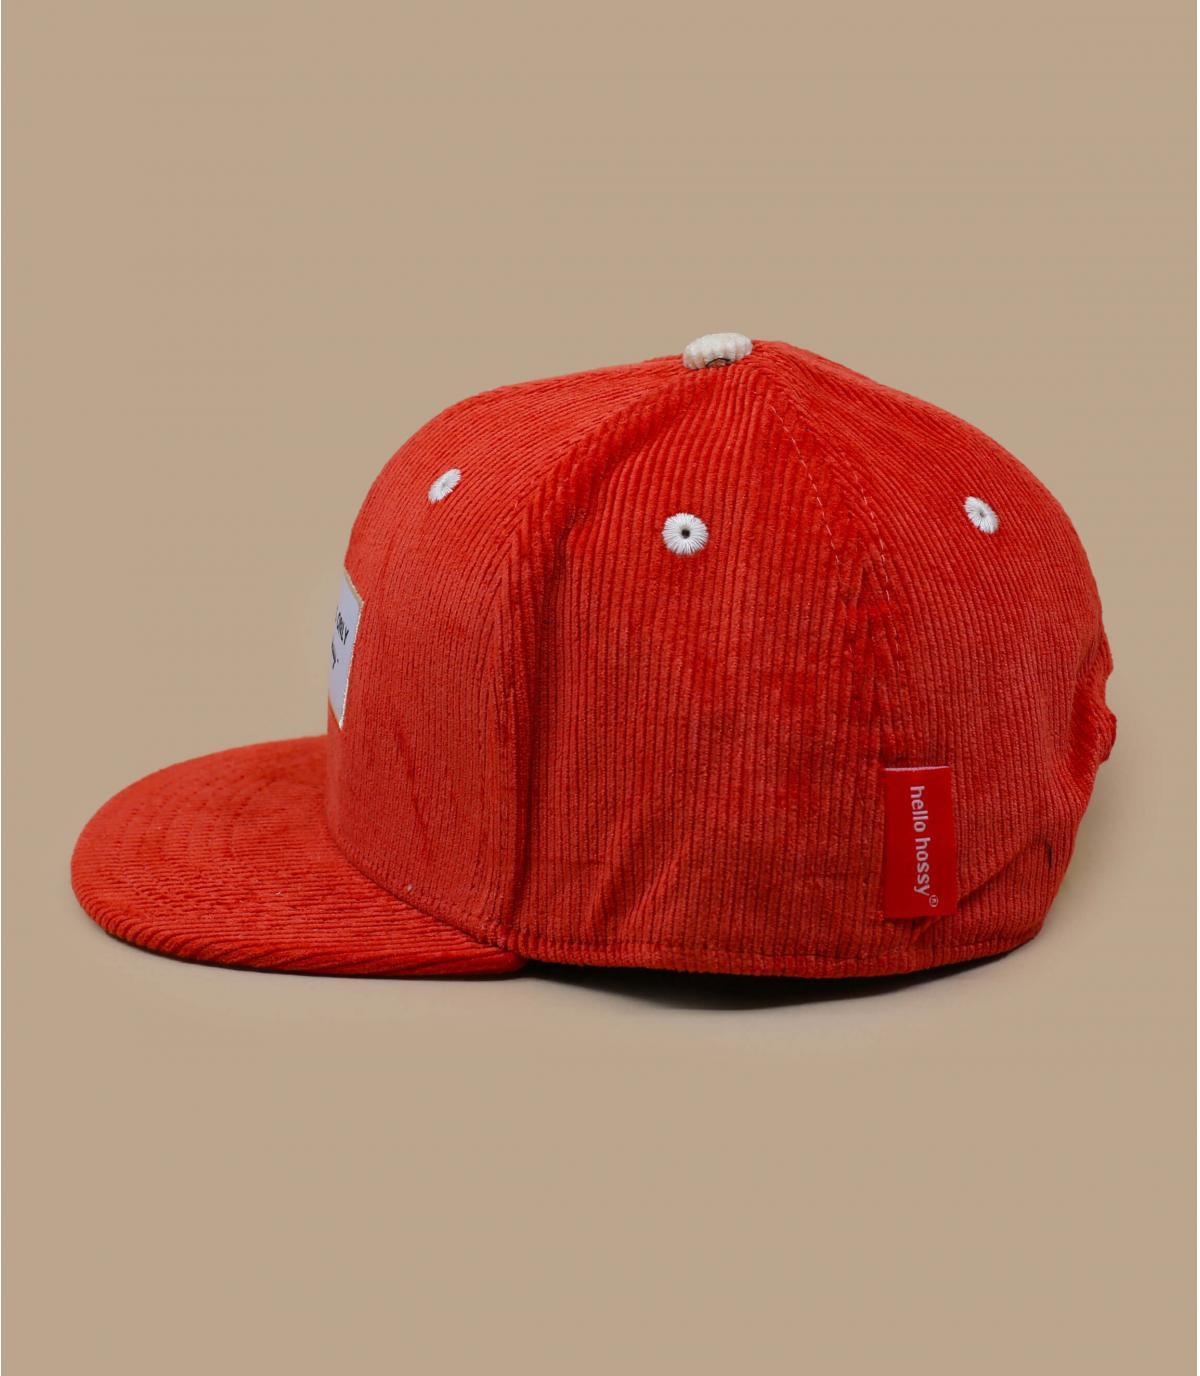 casquette enfant velours orange